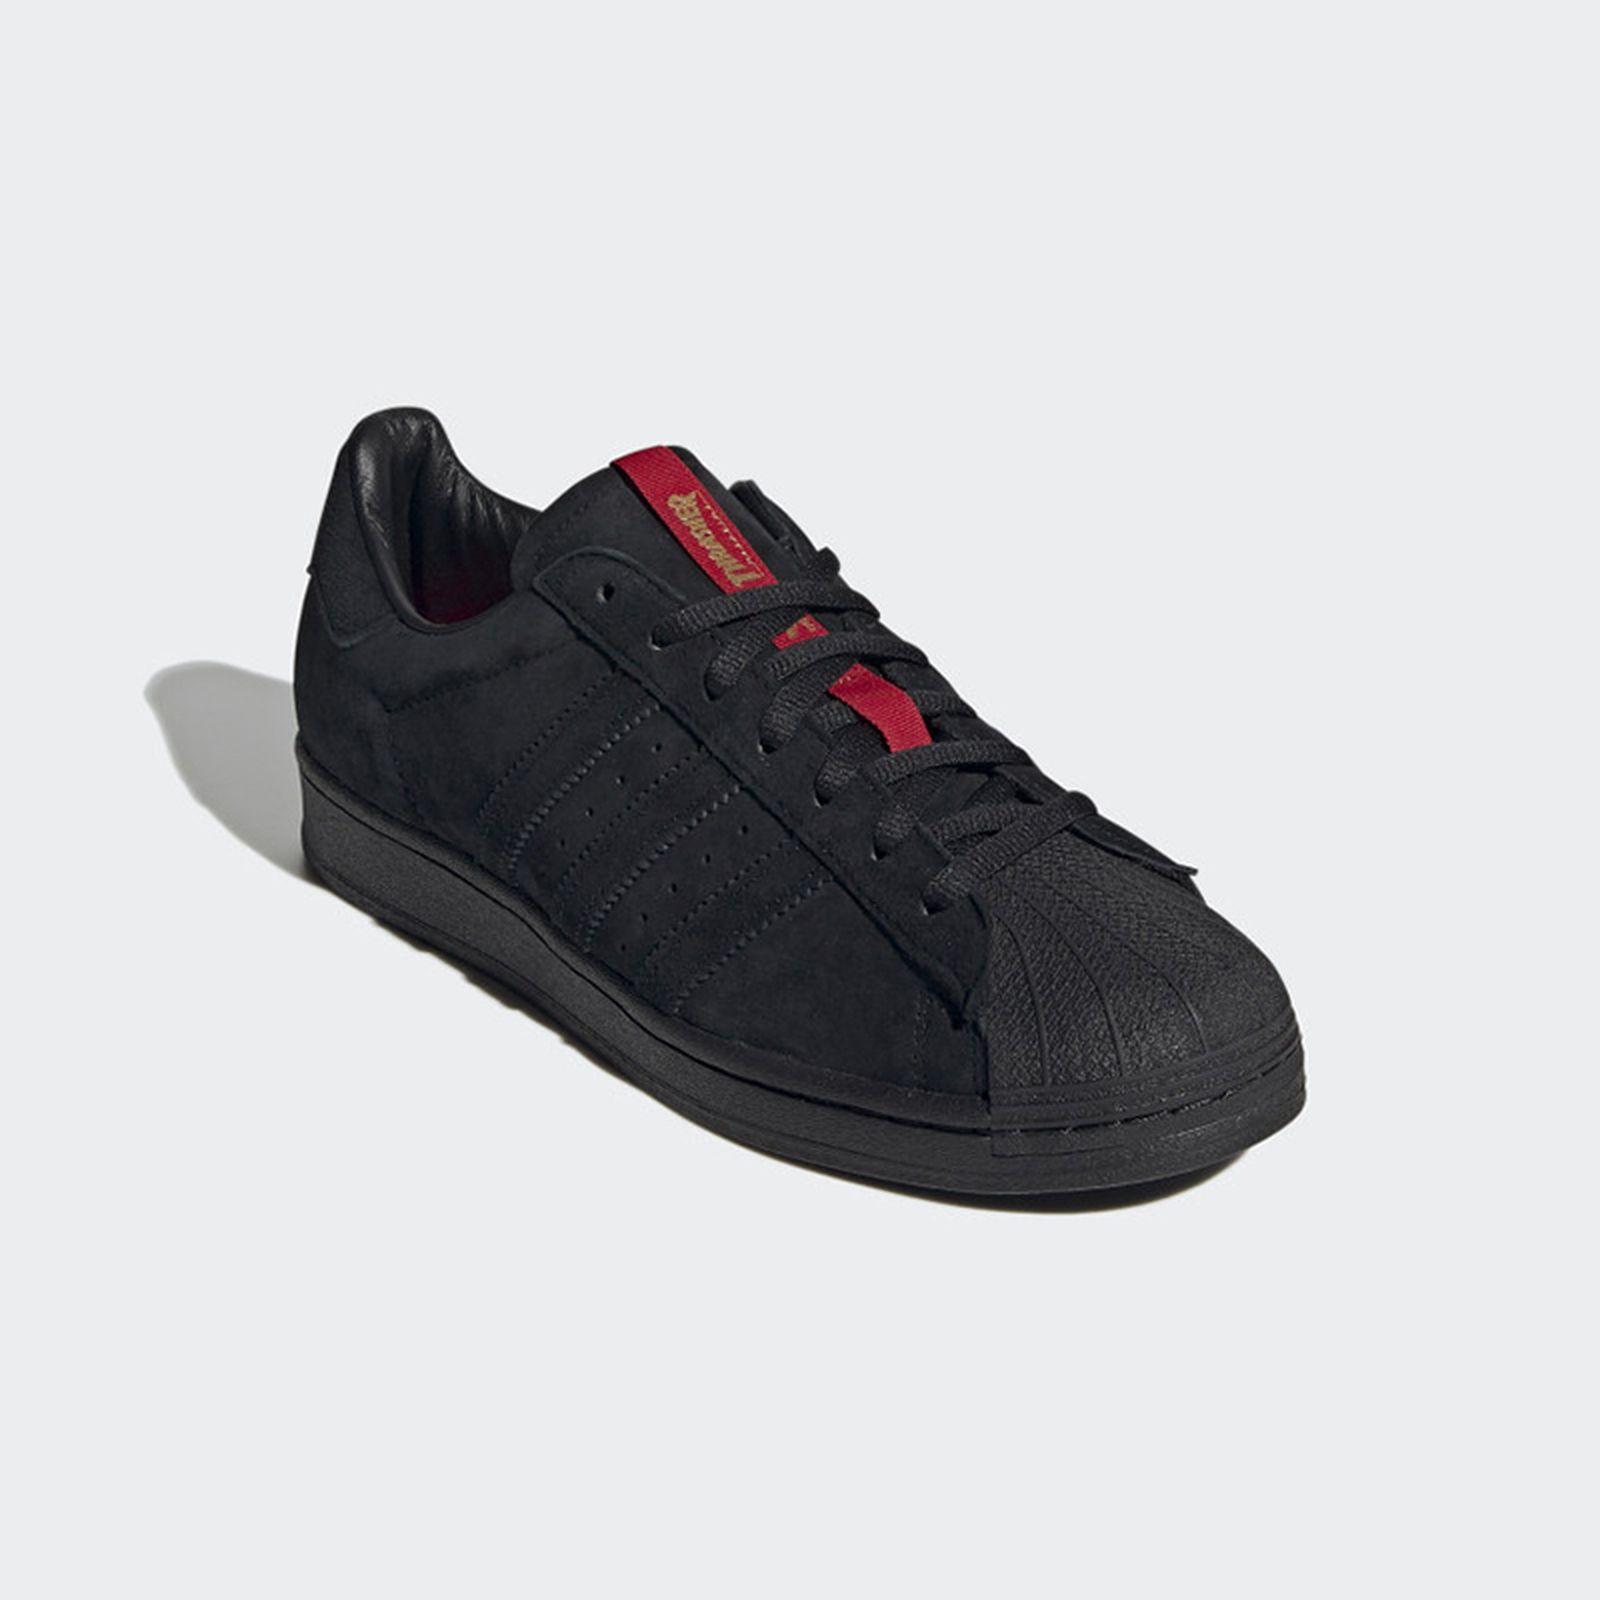 thrasher-adidas-superstar-adv-tyshawn-jones-release-date-price-1-03